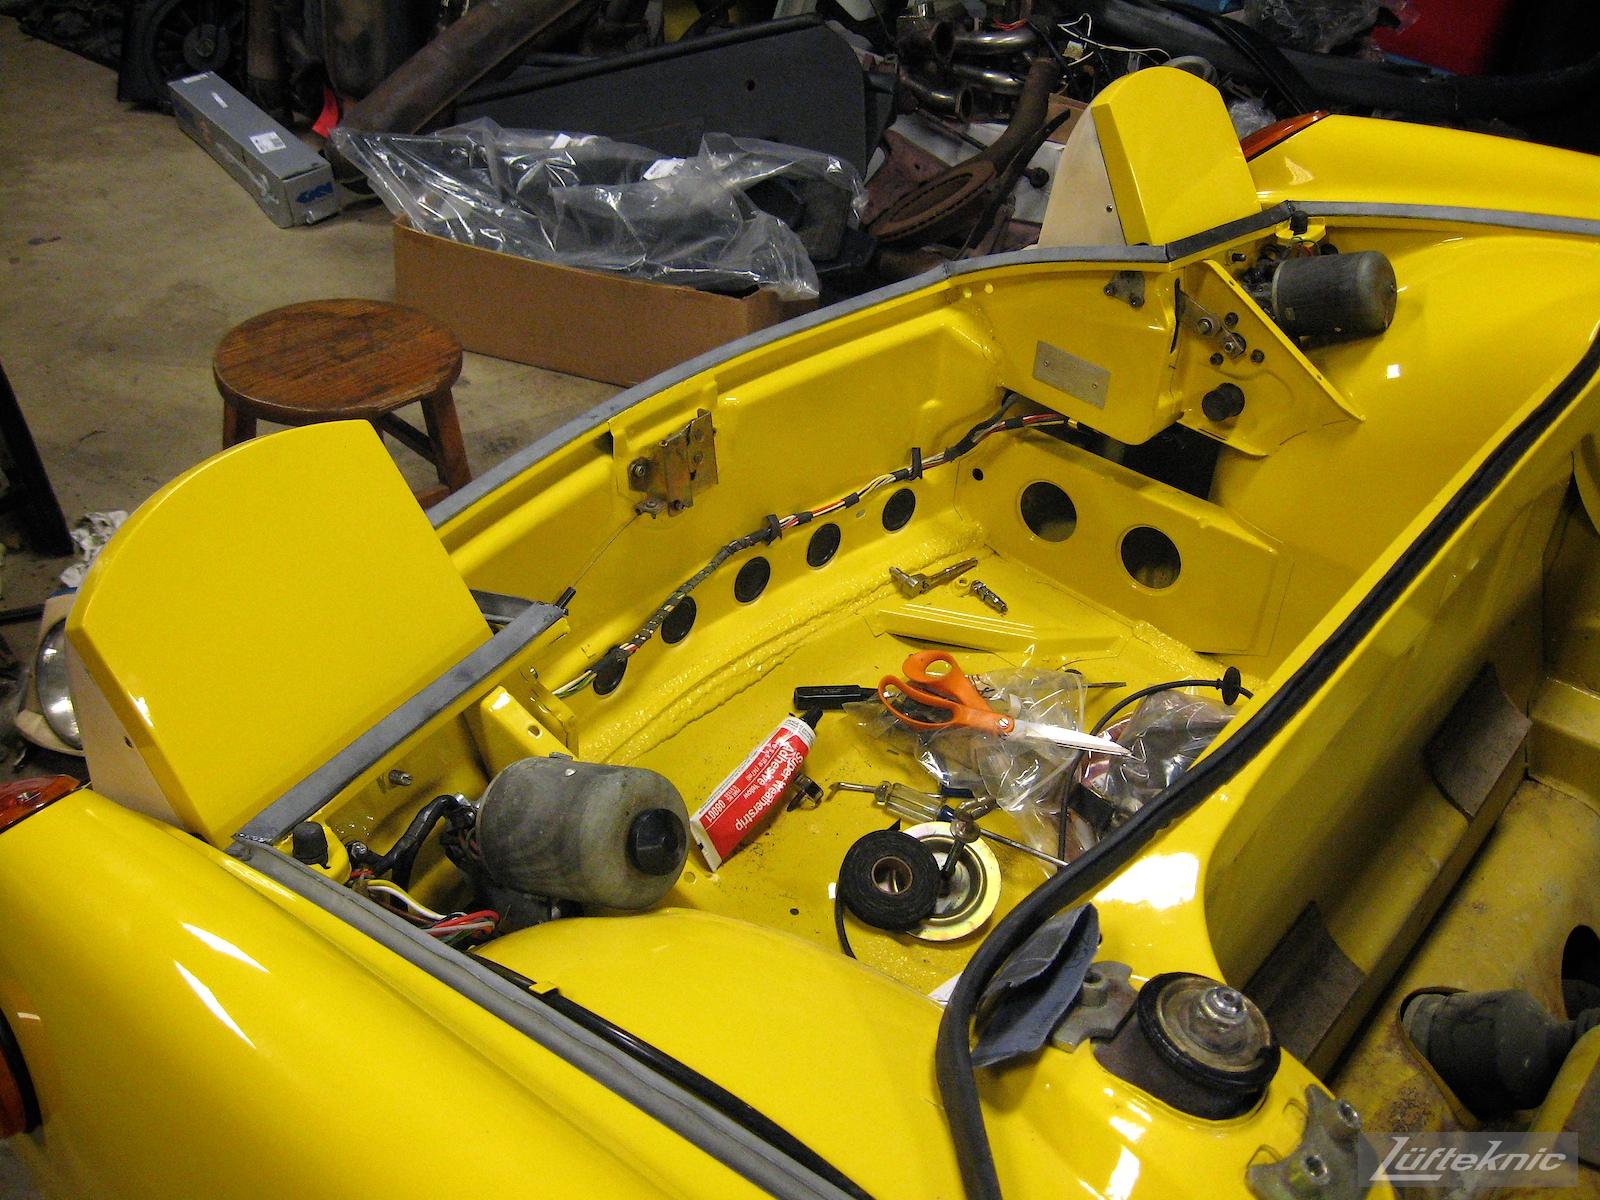 Reassembling headlights and lighting on a restored yellow Porsche 914 at Lufteknic.